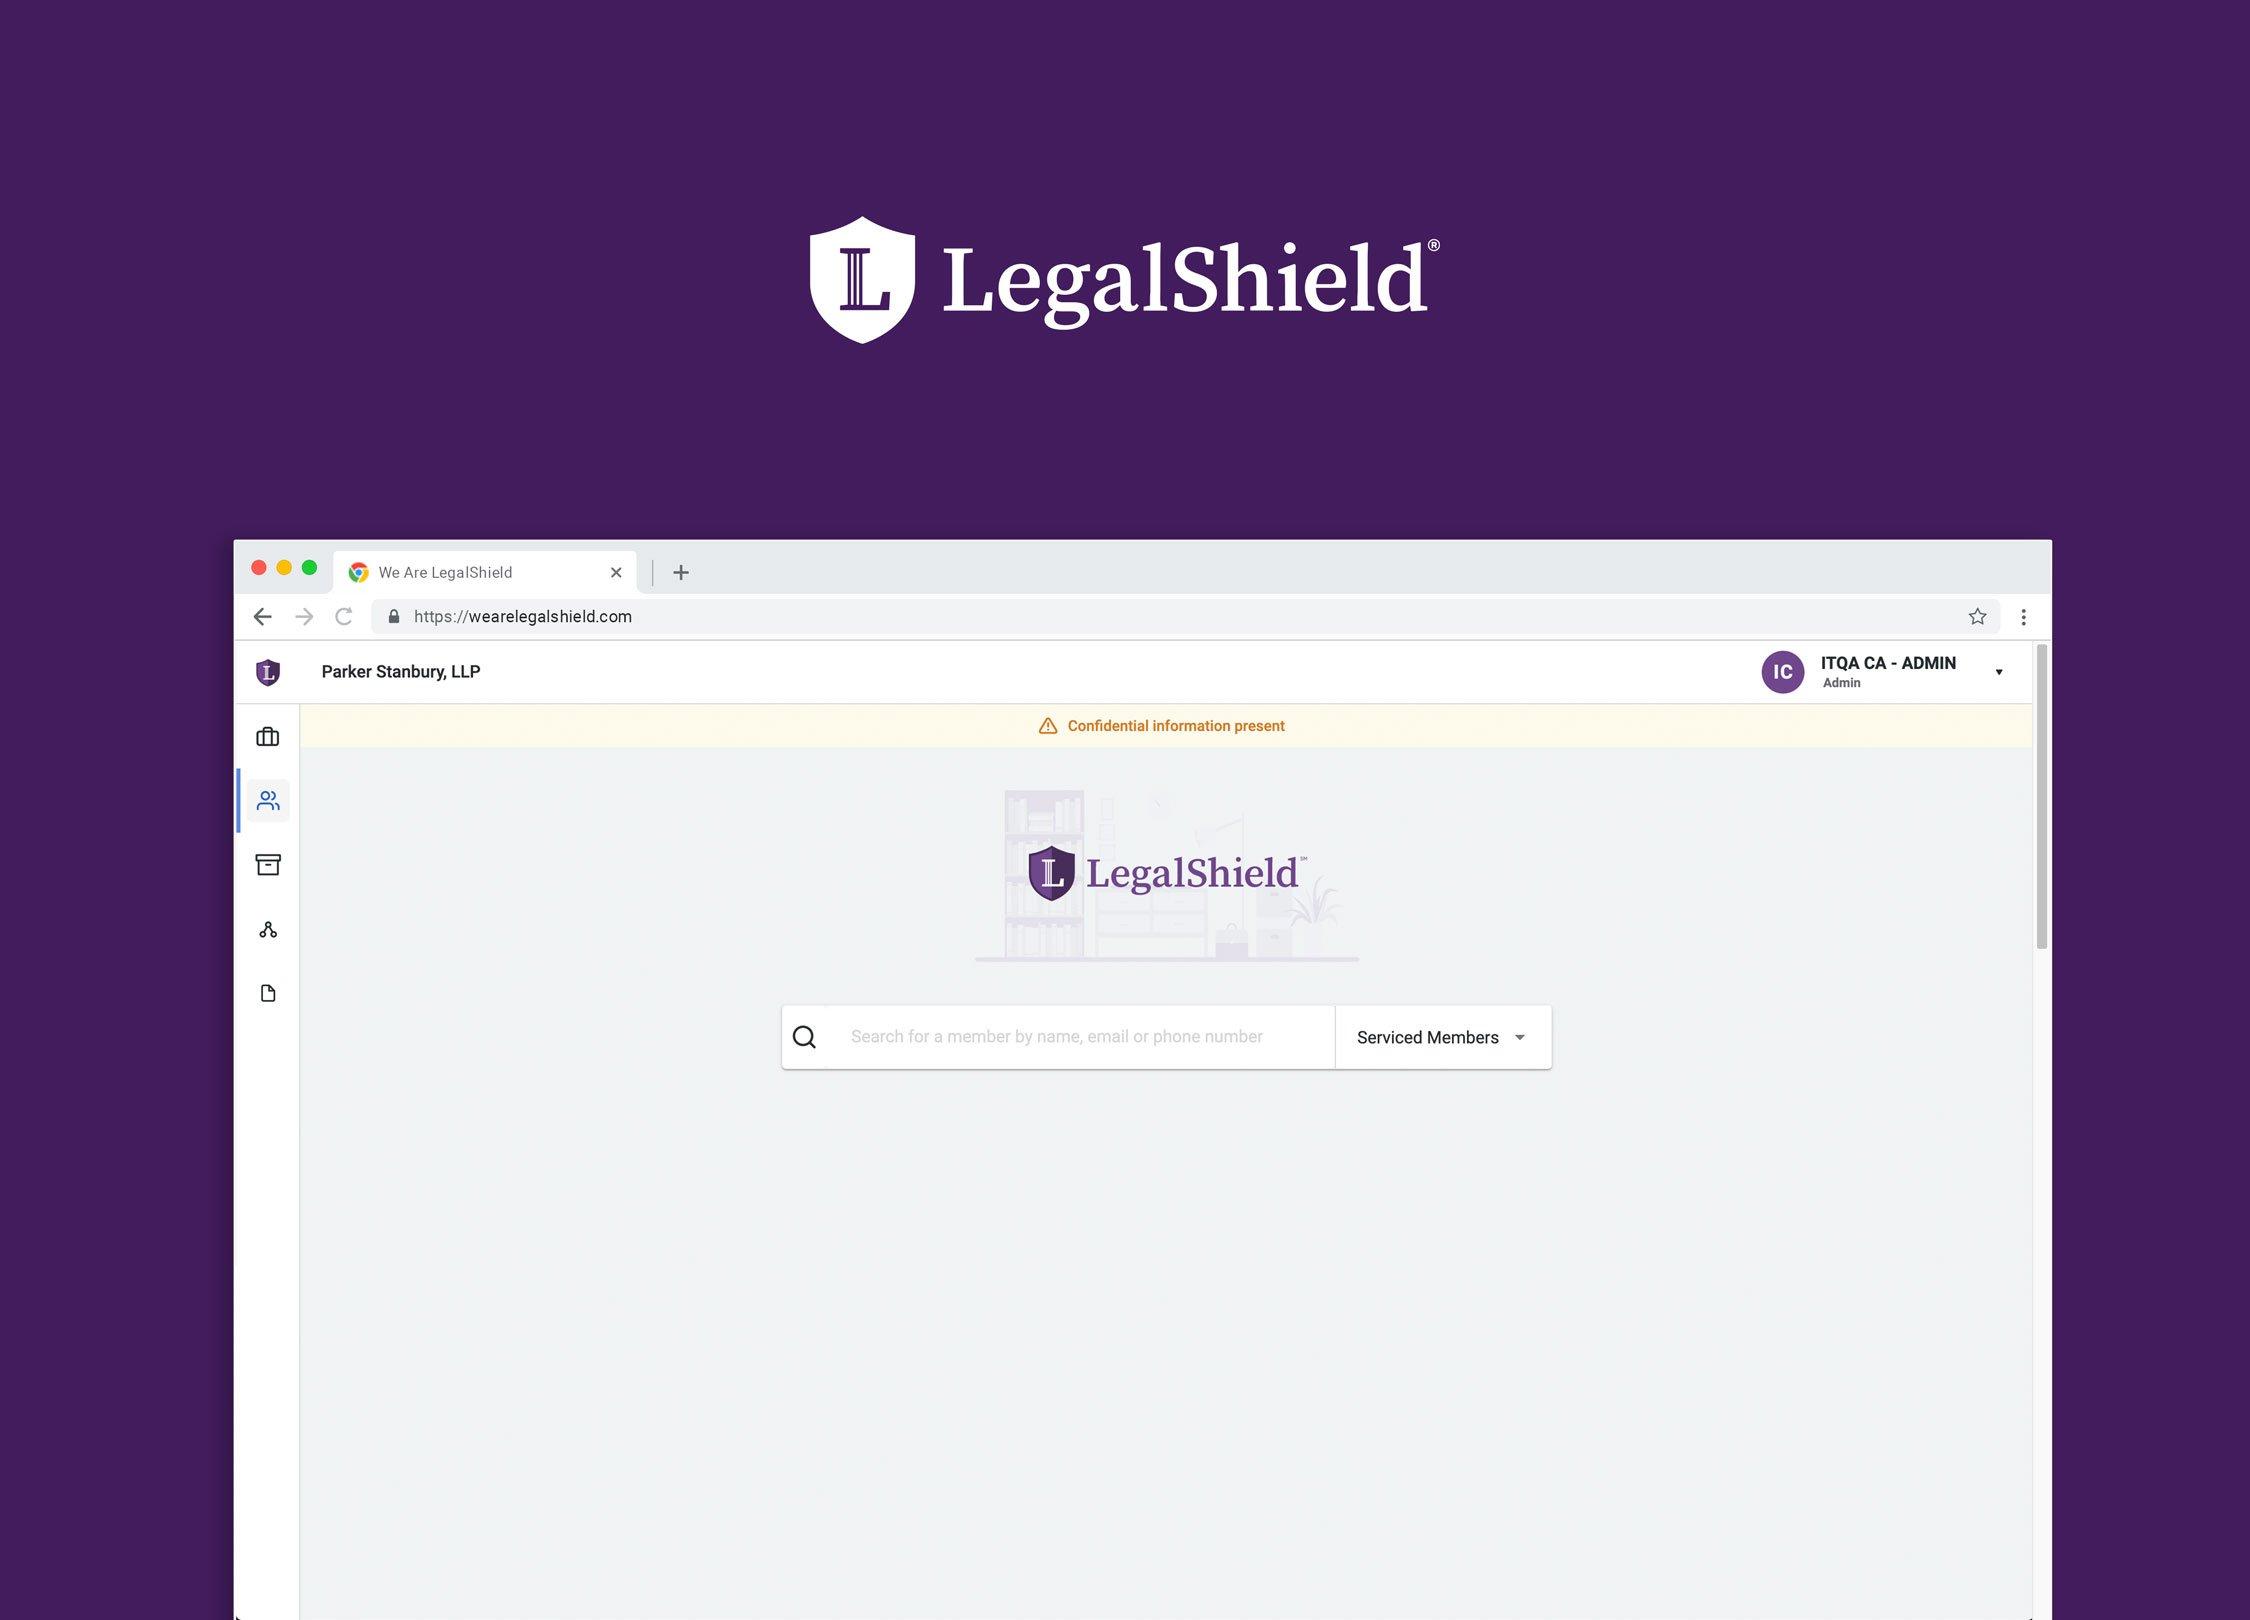 Legalshield partner app cover image